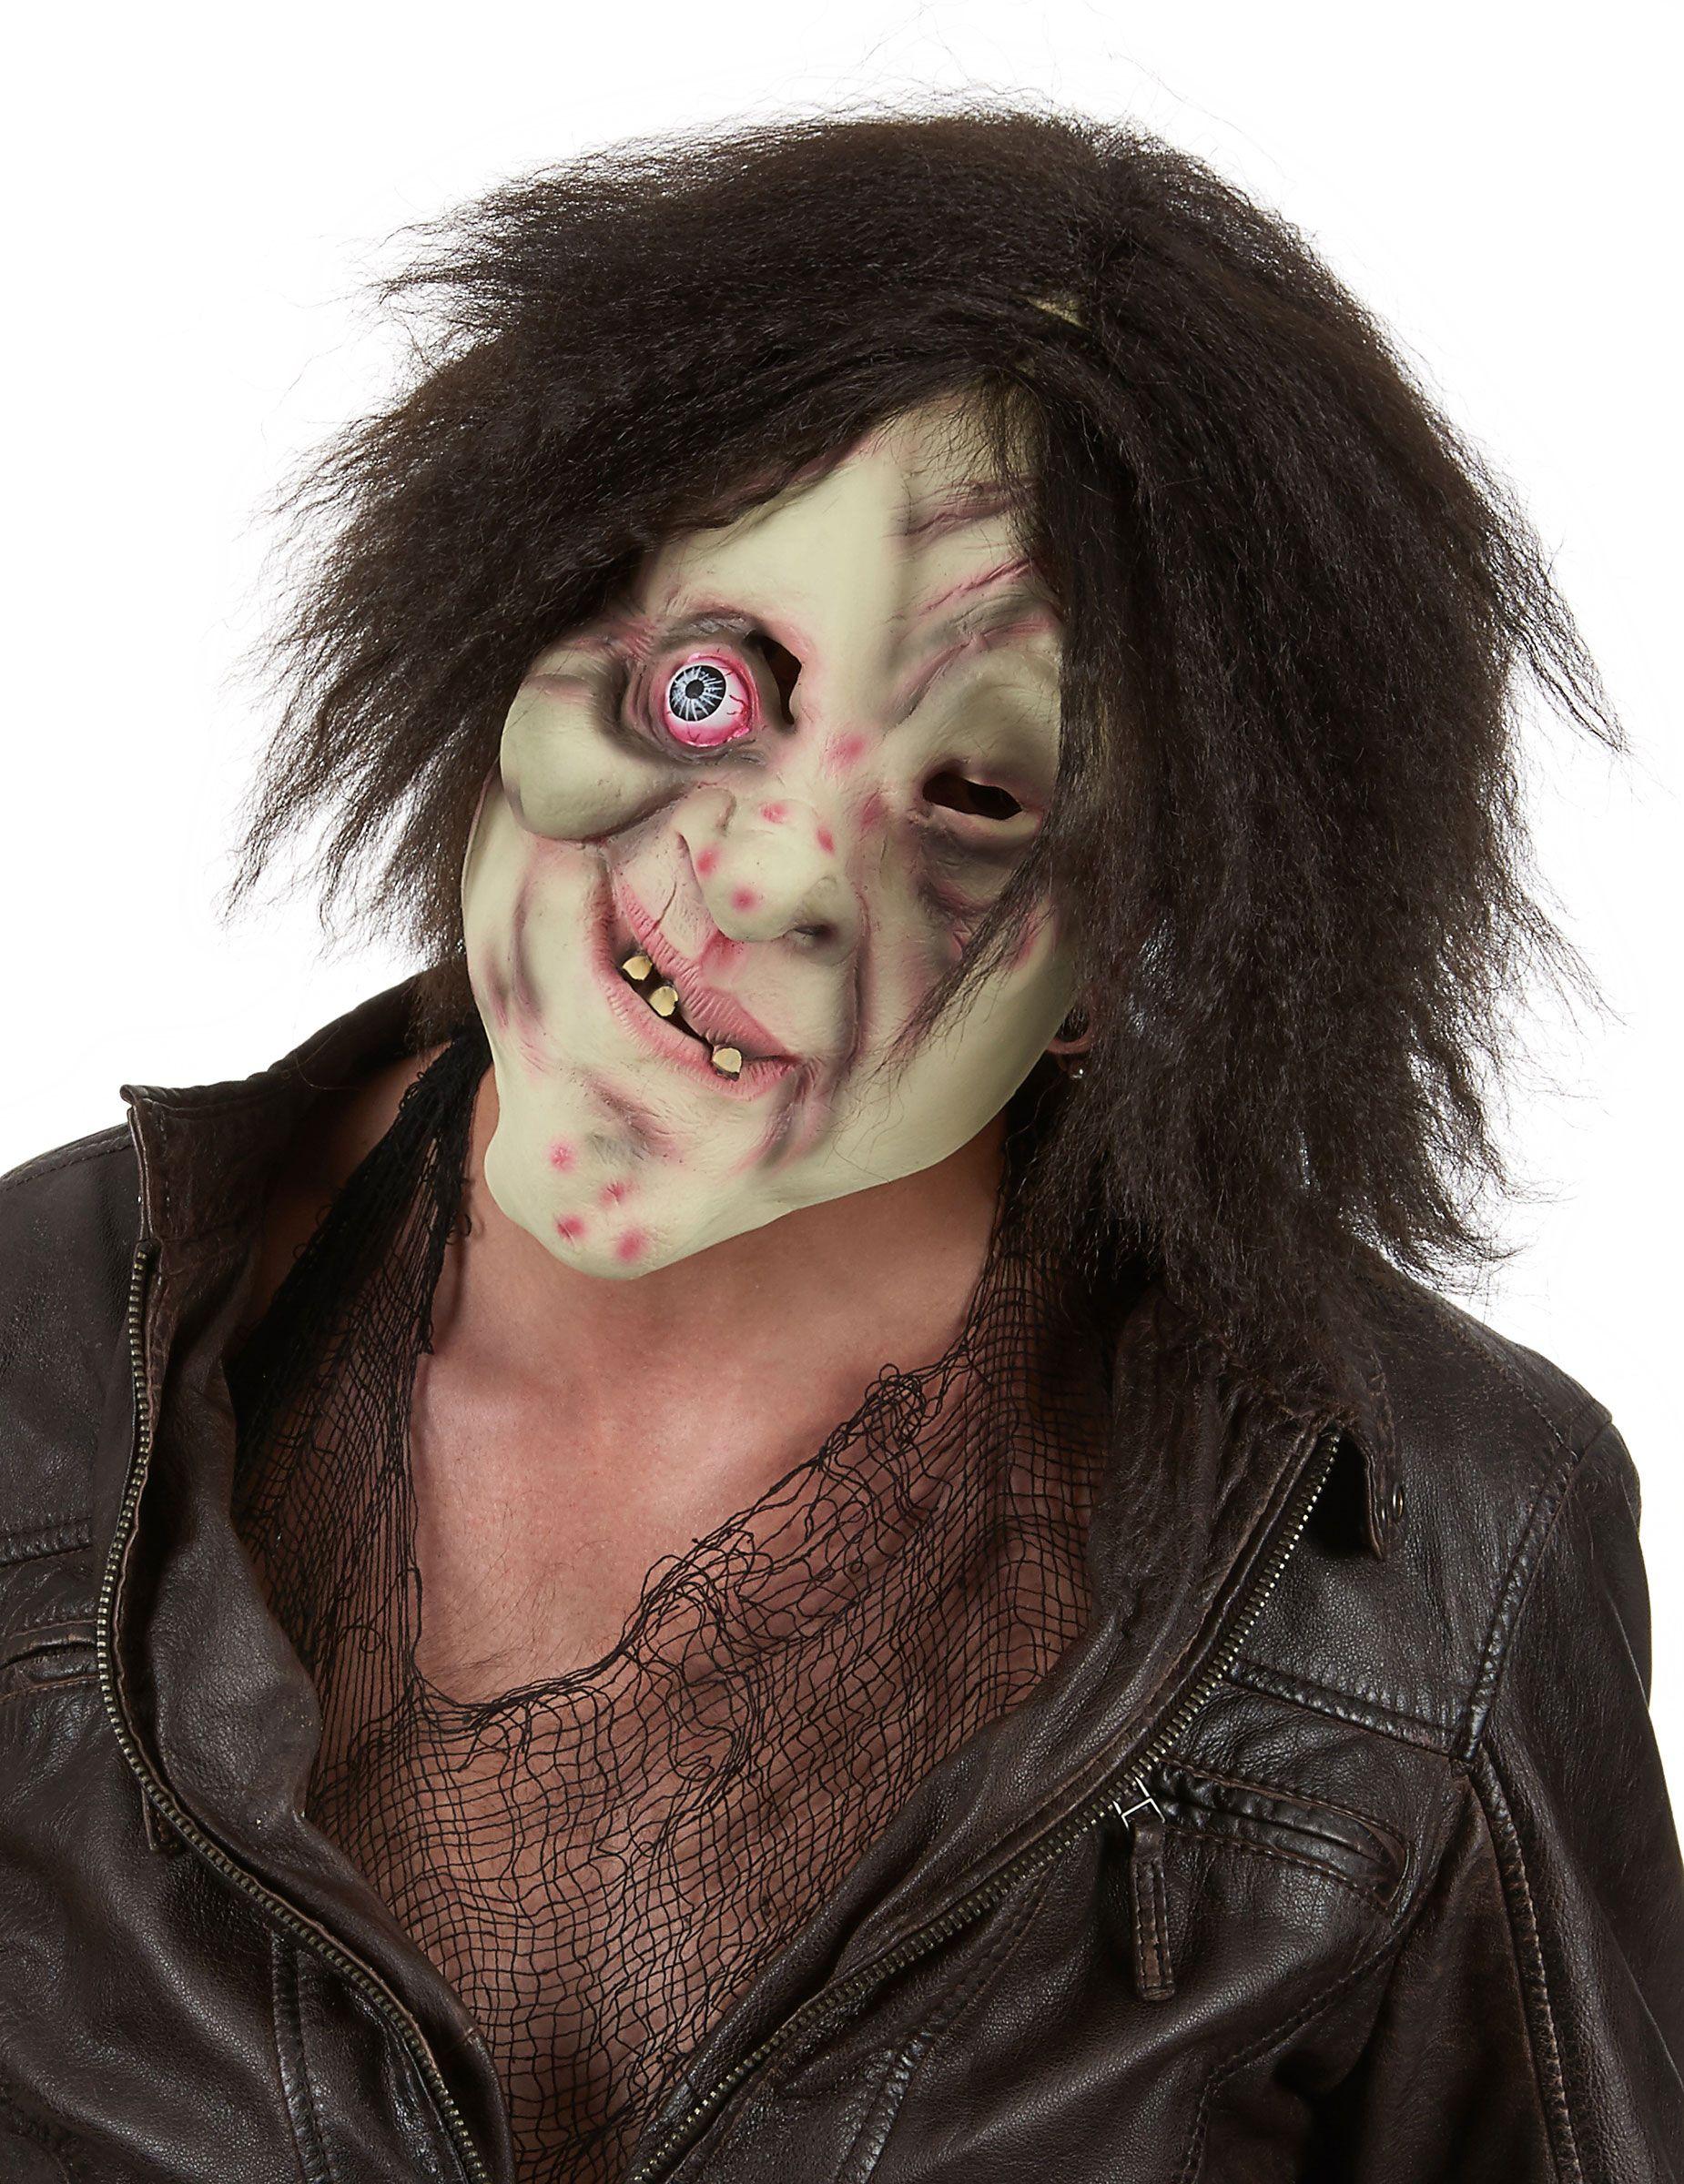 masque bossu avec cheveux adulte halloween ce masque de. Black Bedroom Furniture Sets. Home Design Ideas